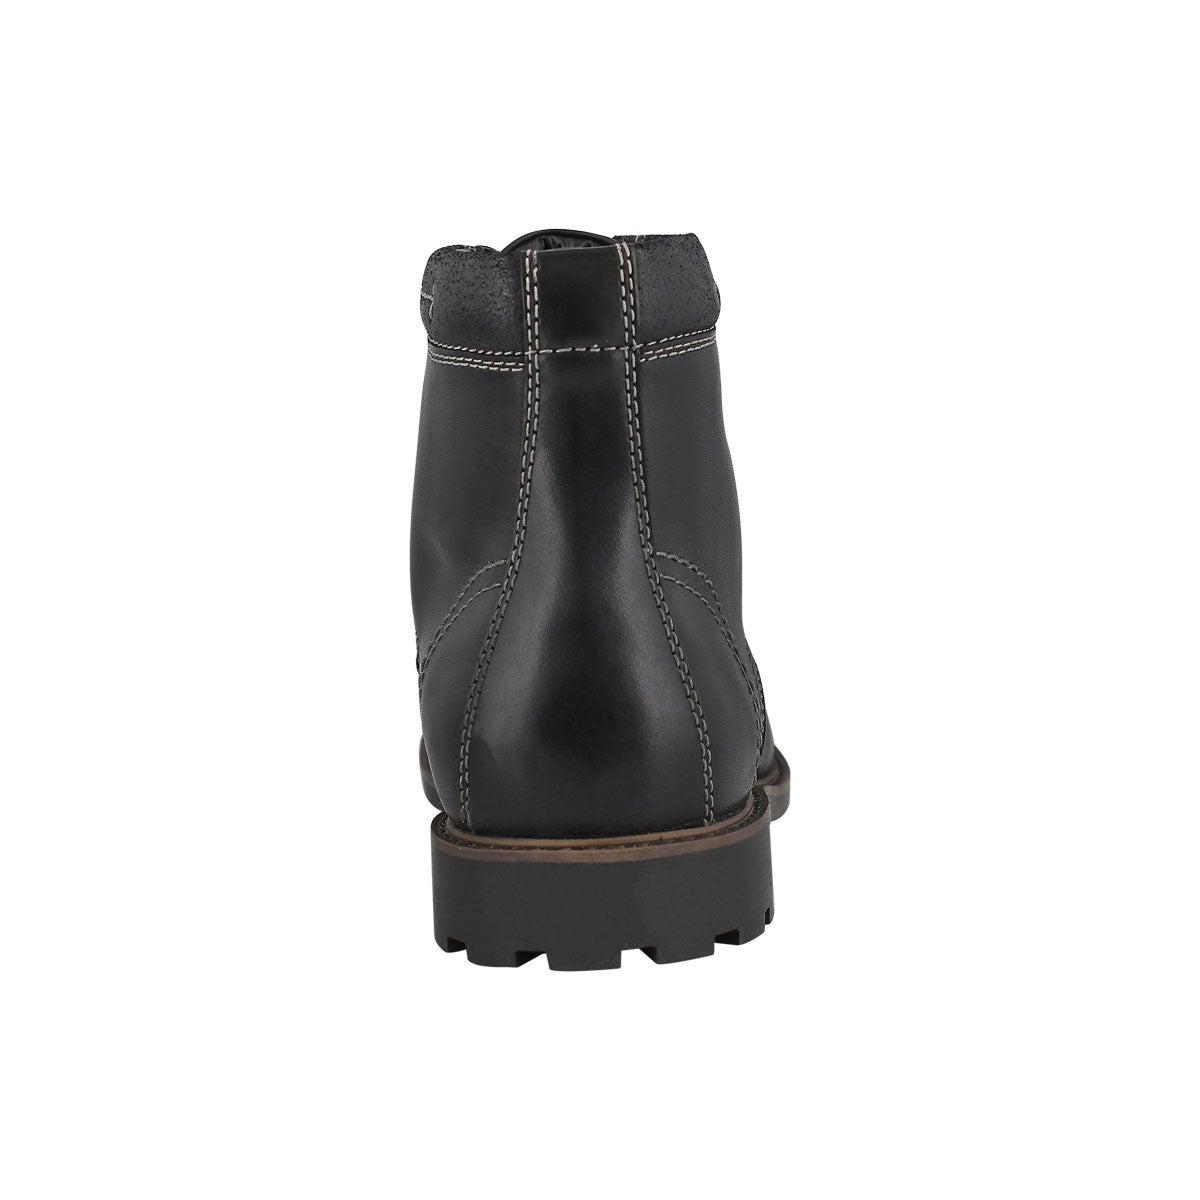 Mns Curington High black laceup ank boot